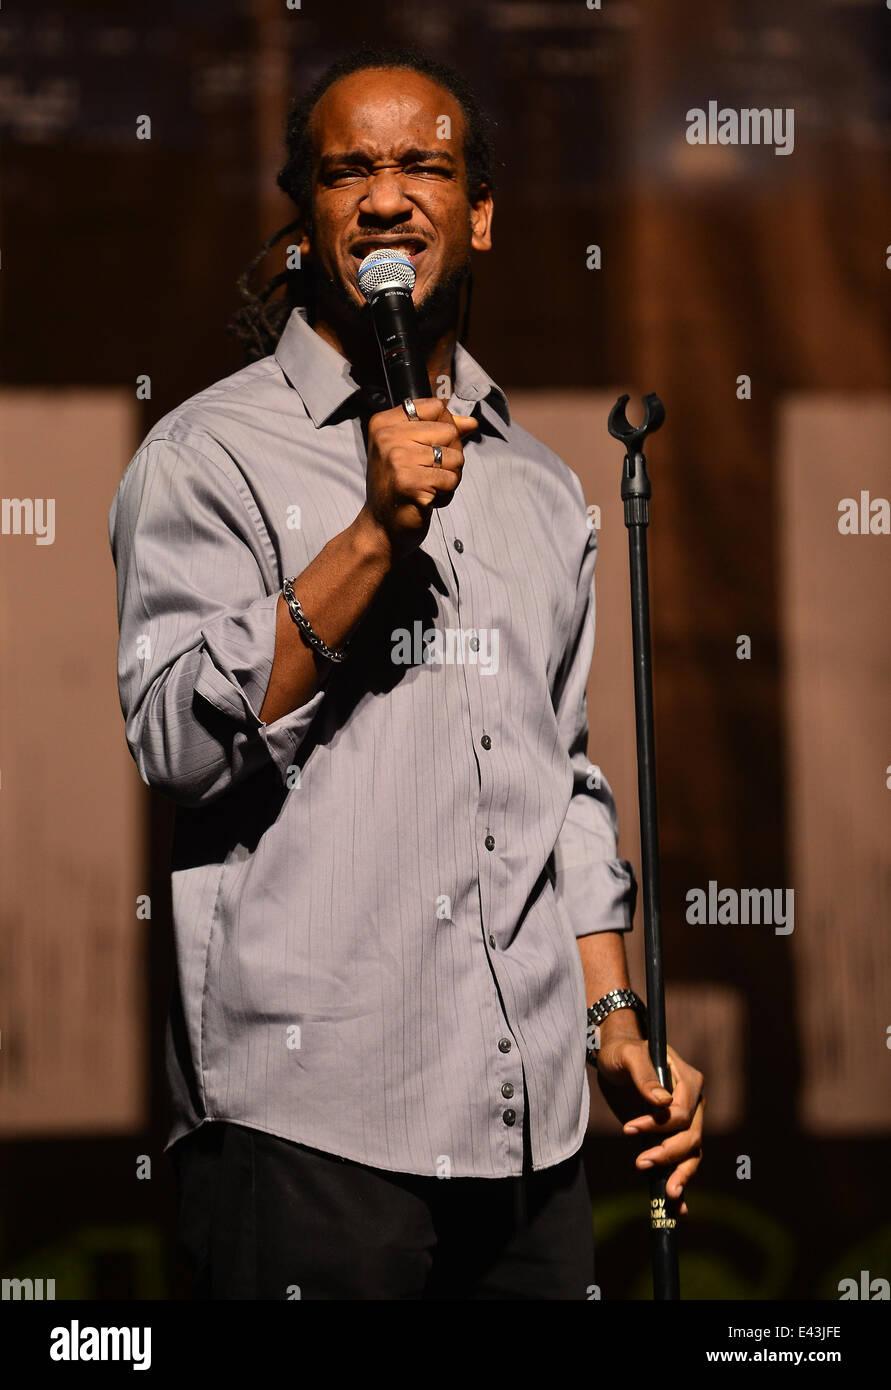 Katt Williams Growth Spurt comedy tour at the James L Knight Center  Featuring: Comedian Chello Where: Miami, Florida, - Stock Image